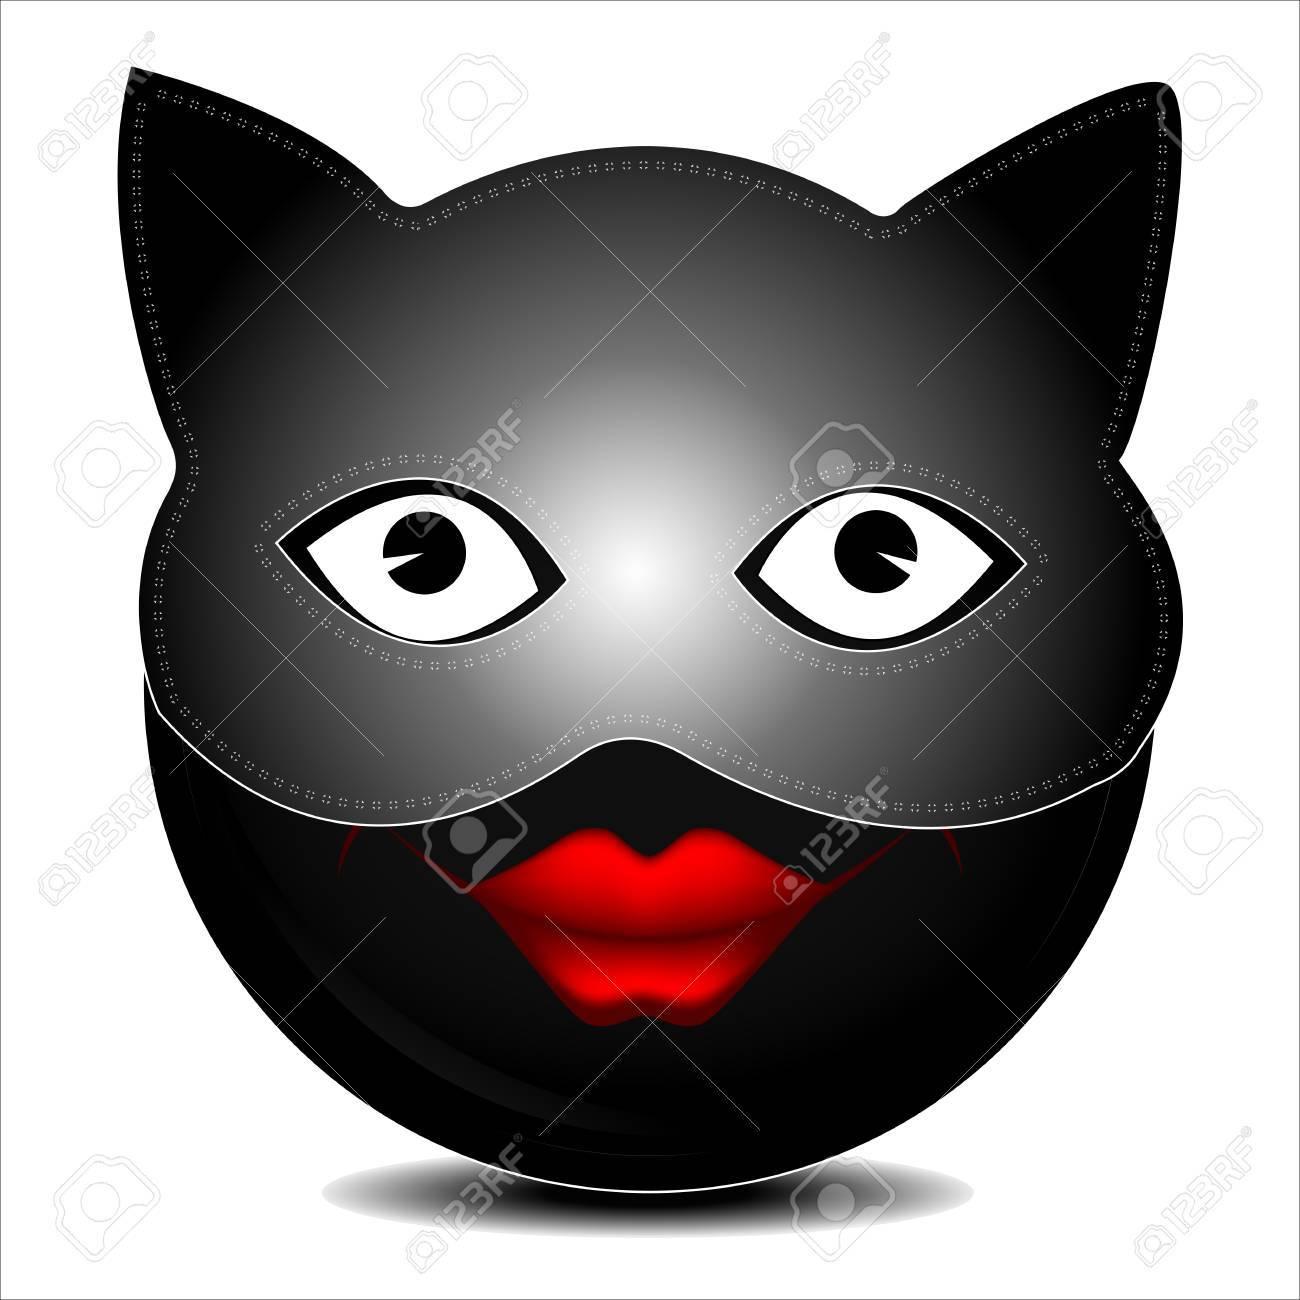 Cat Caractère De Sourire De Masque Clip Art Libres De Droits